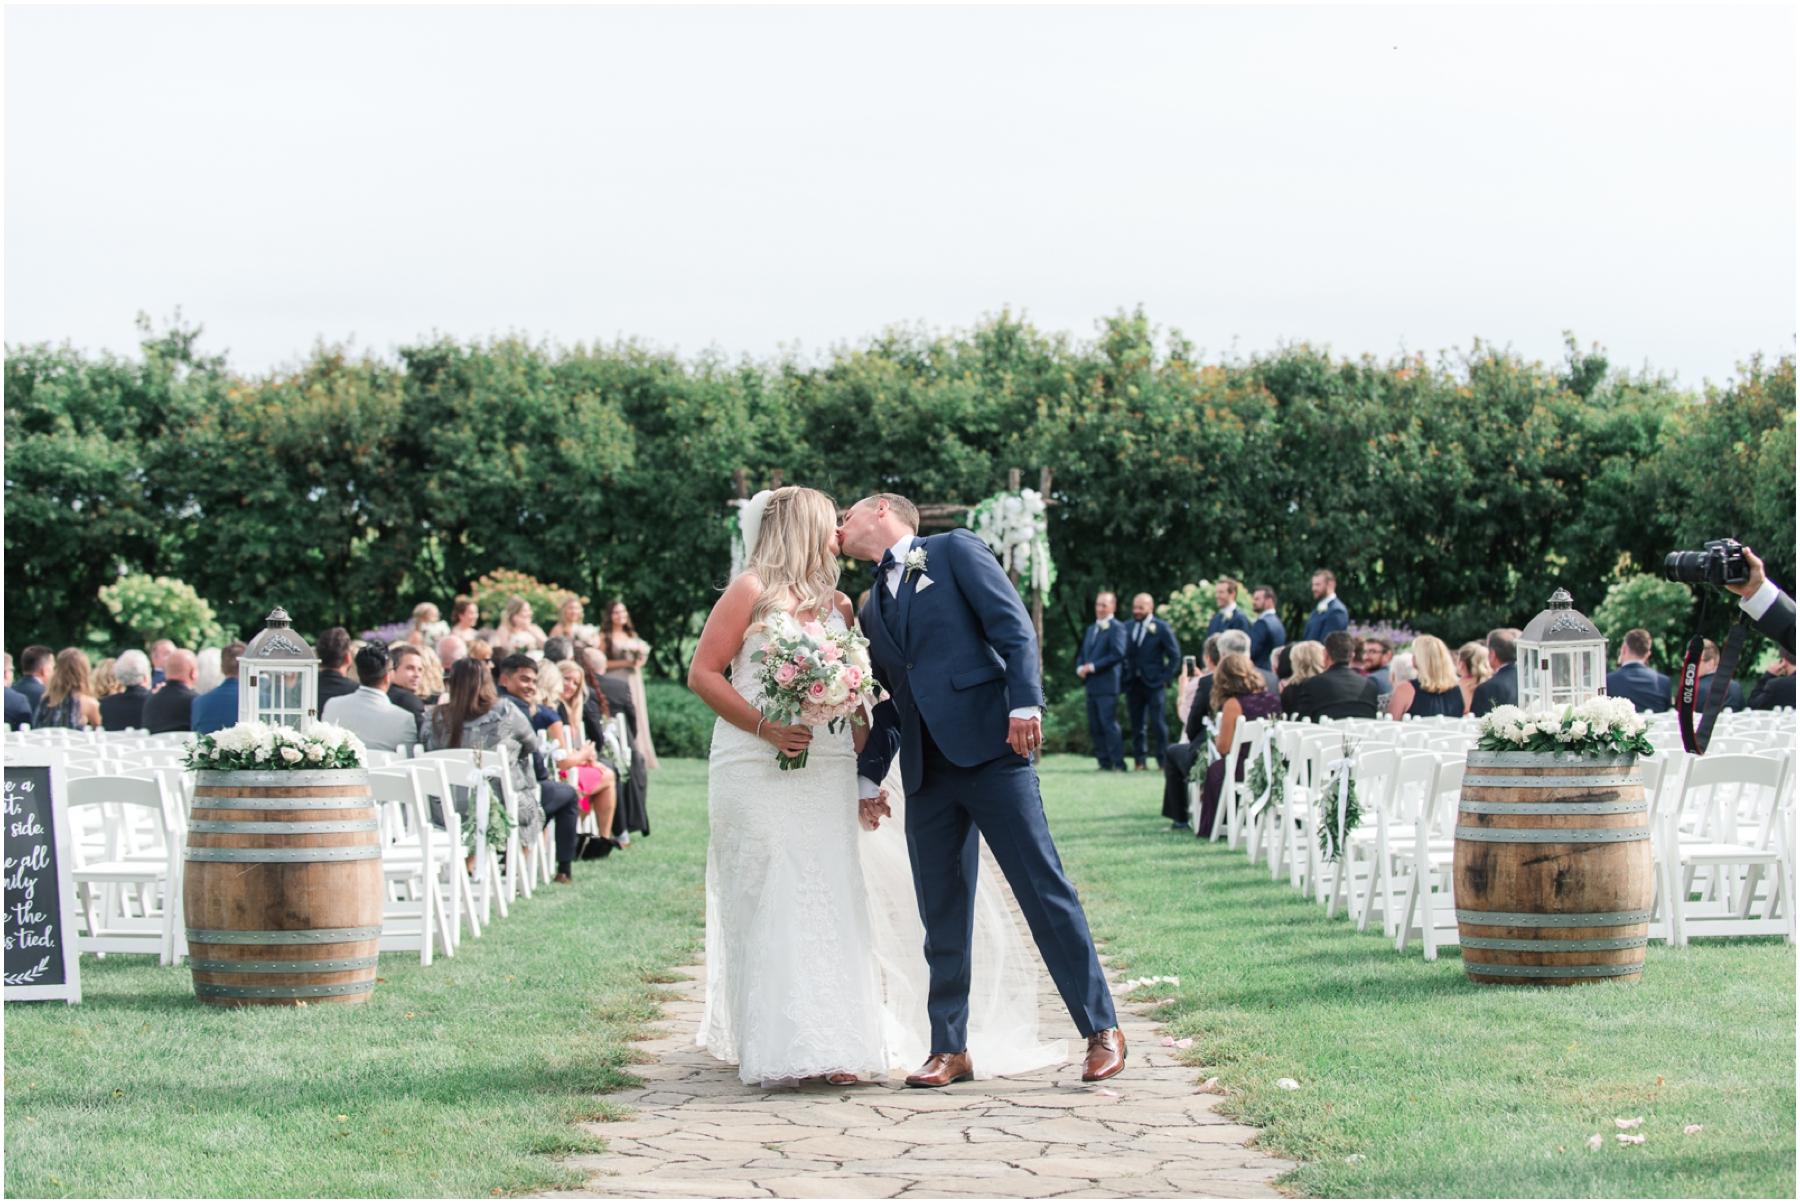 Bloom Field Gardens Wedding Precious Photography Katherine & Chris_051